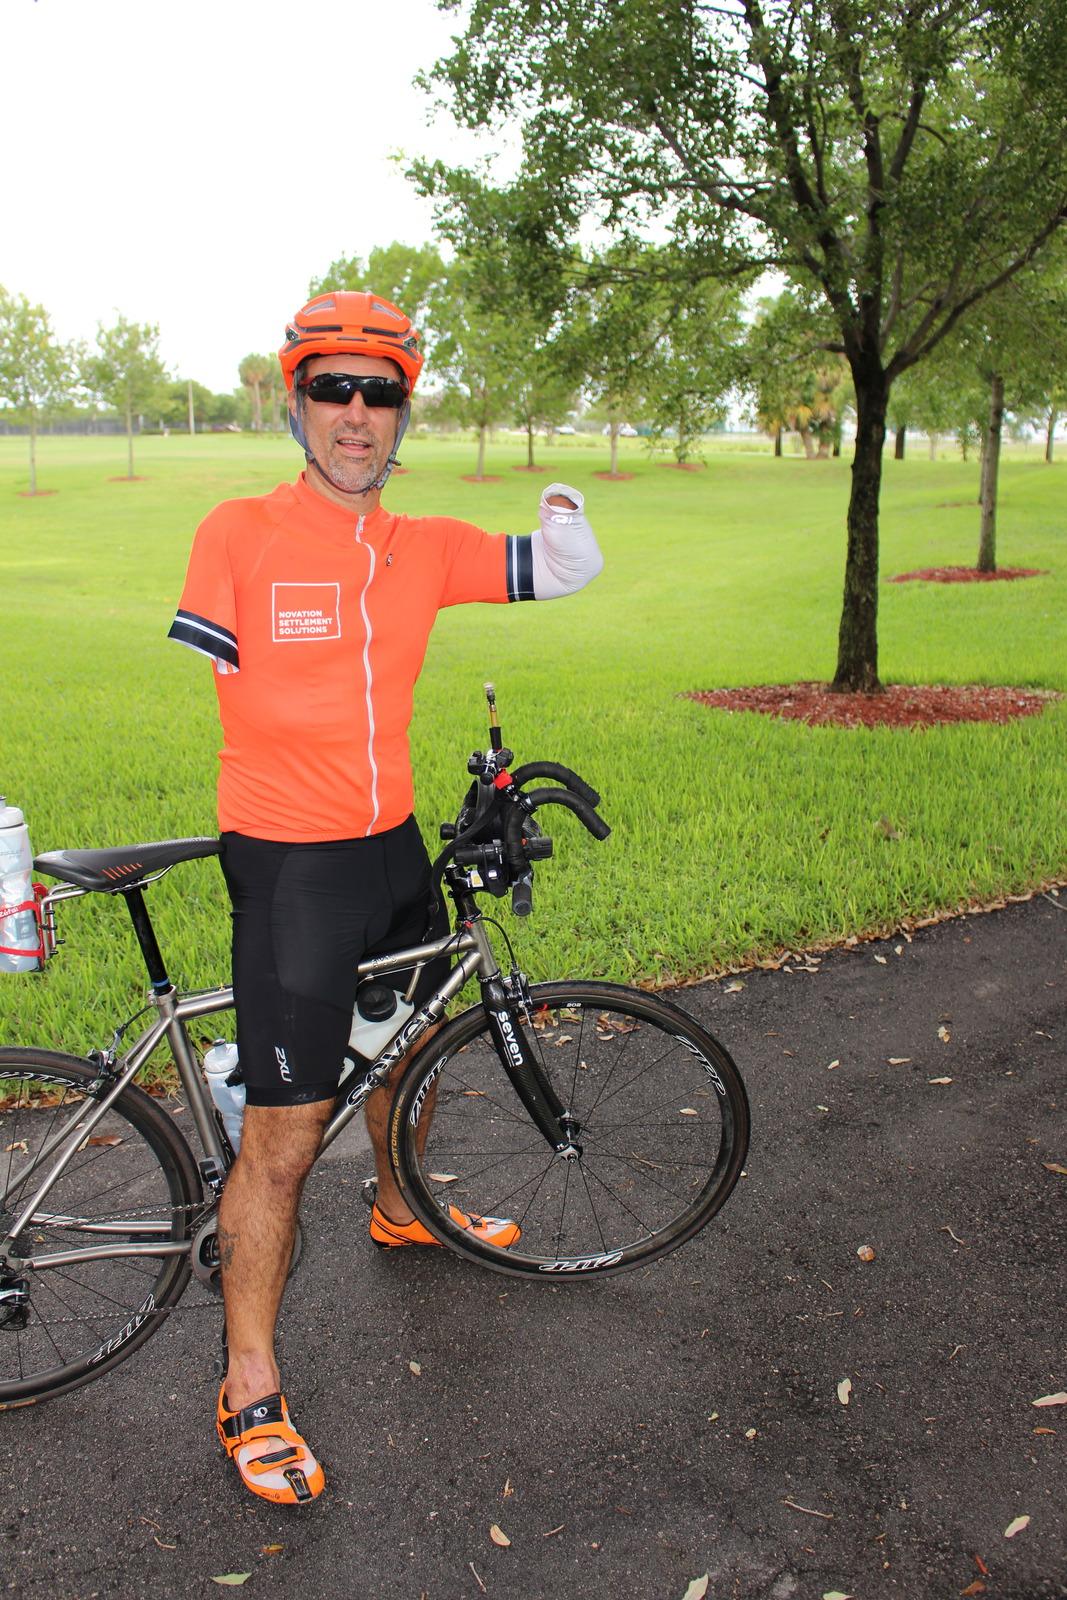 Novation Sponsors Adaptive Triathlete Hector Picard